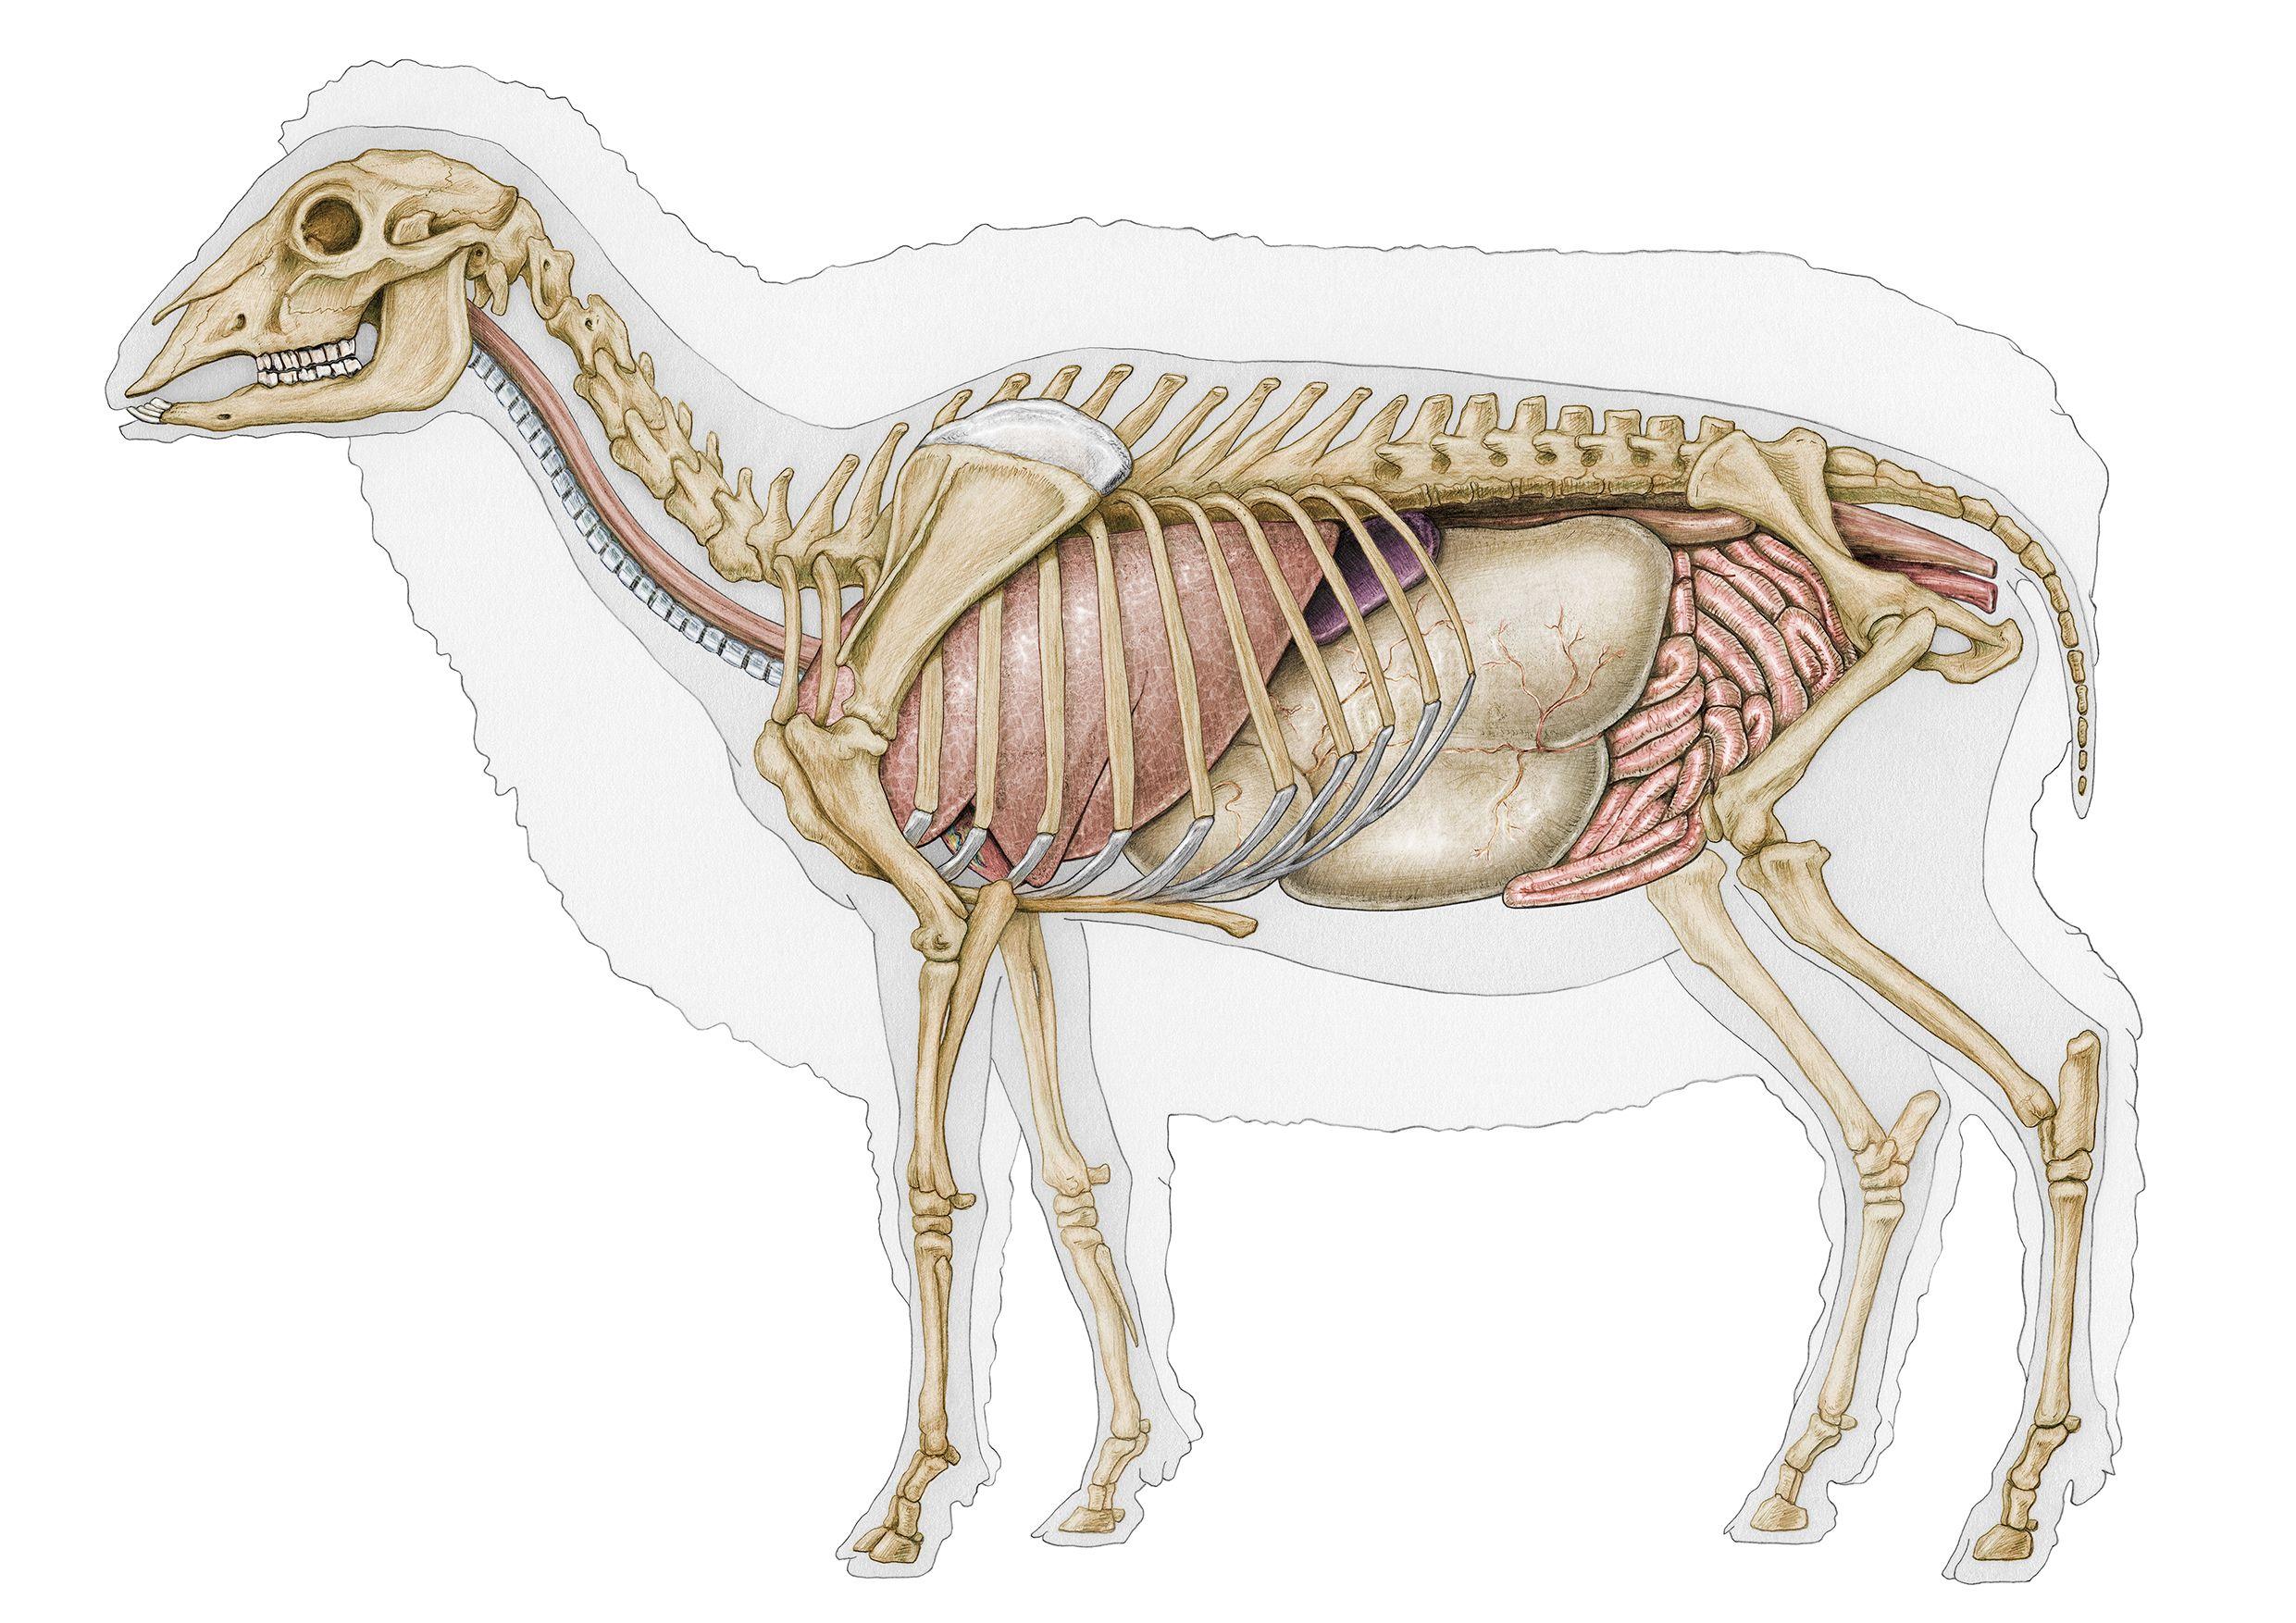 Sheep anatomy skeleton